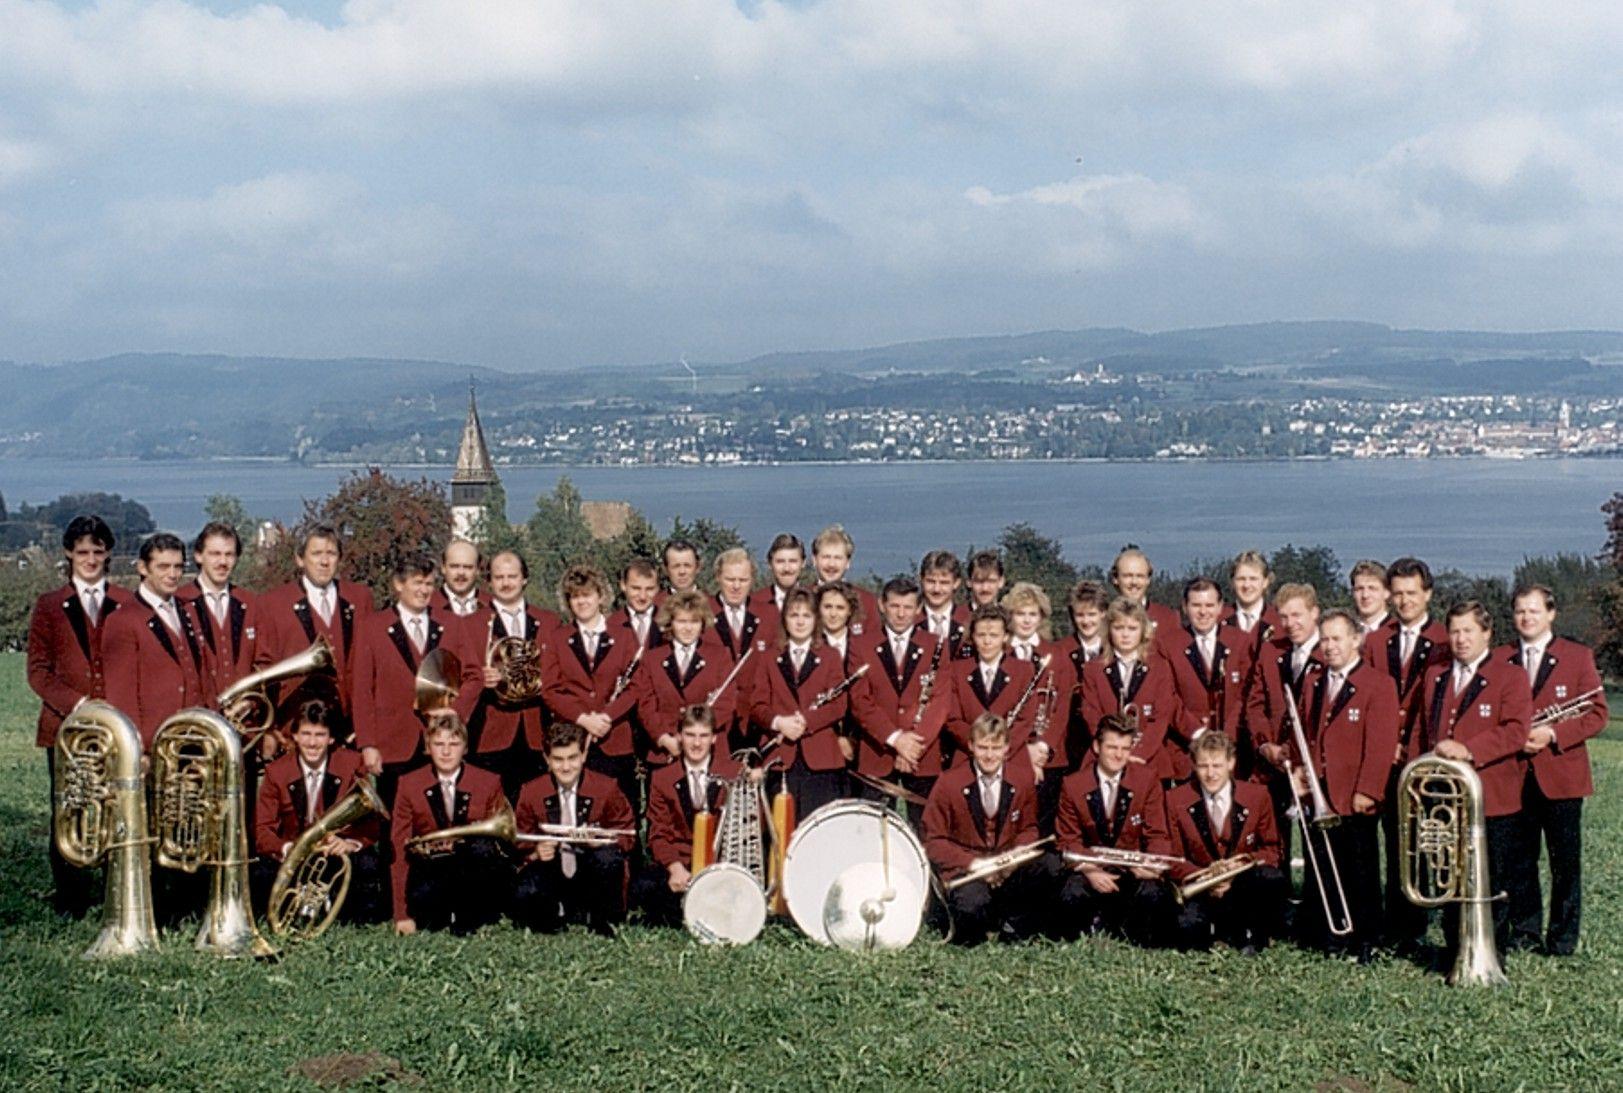 1981 dritte Uniform